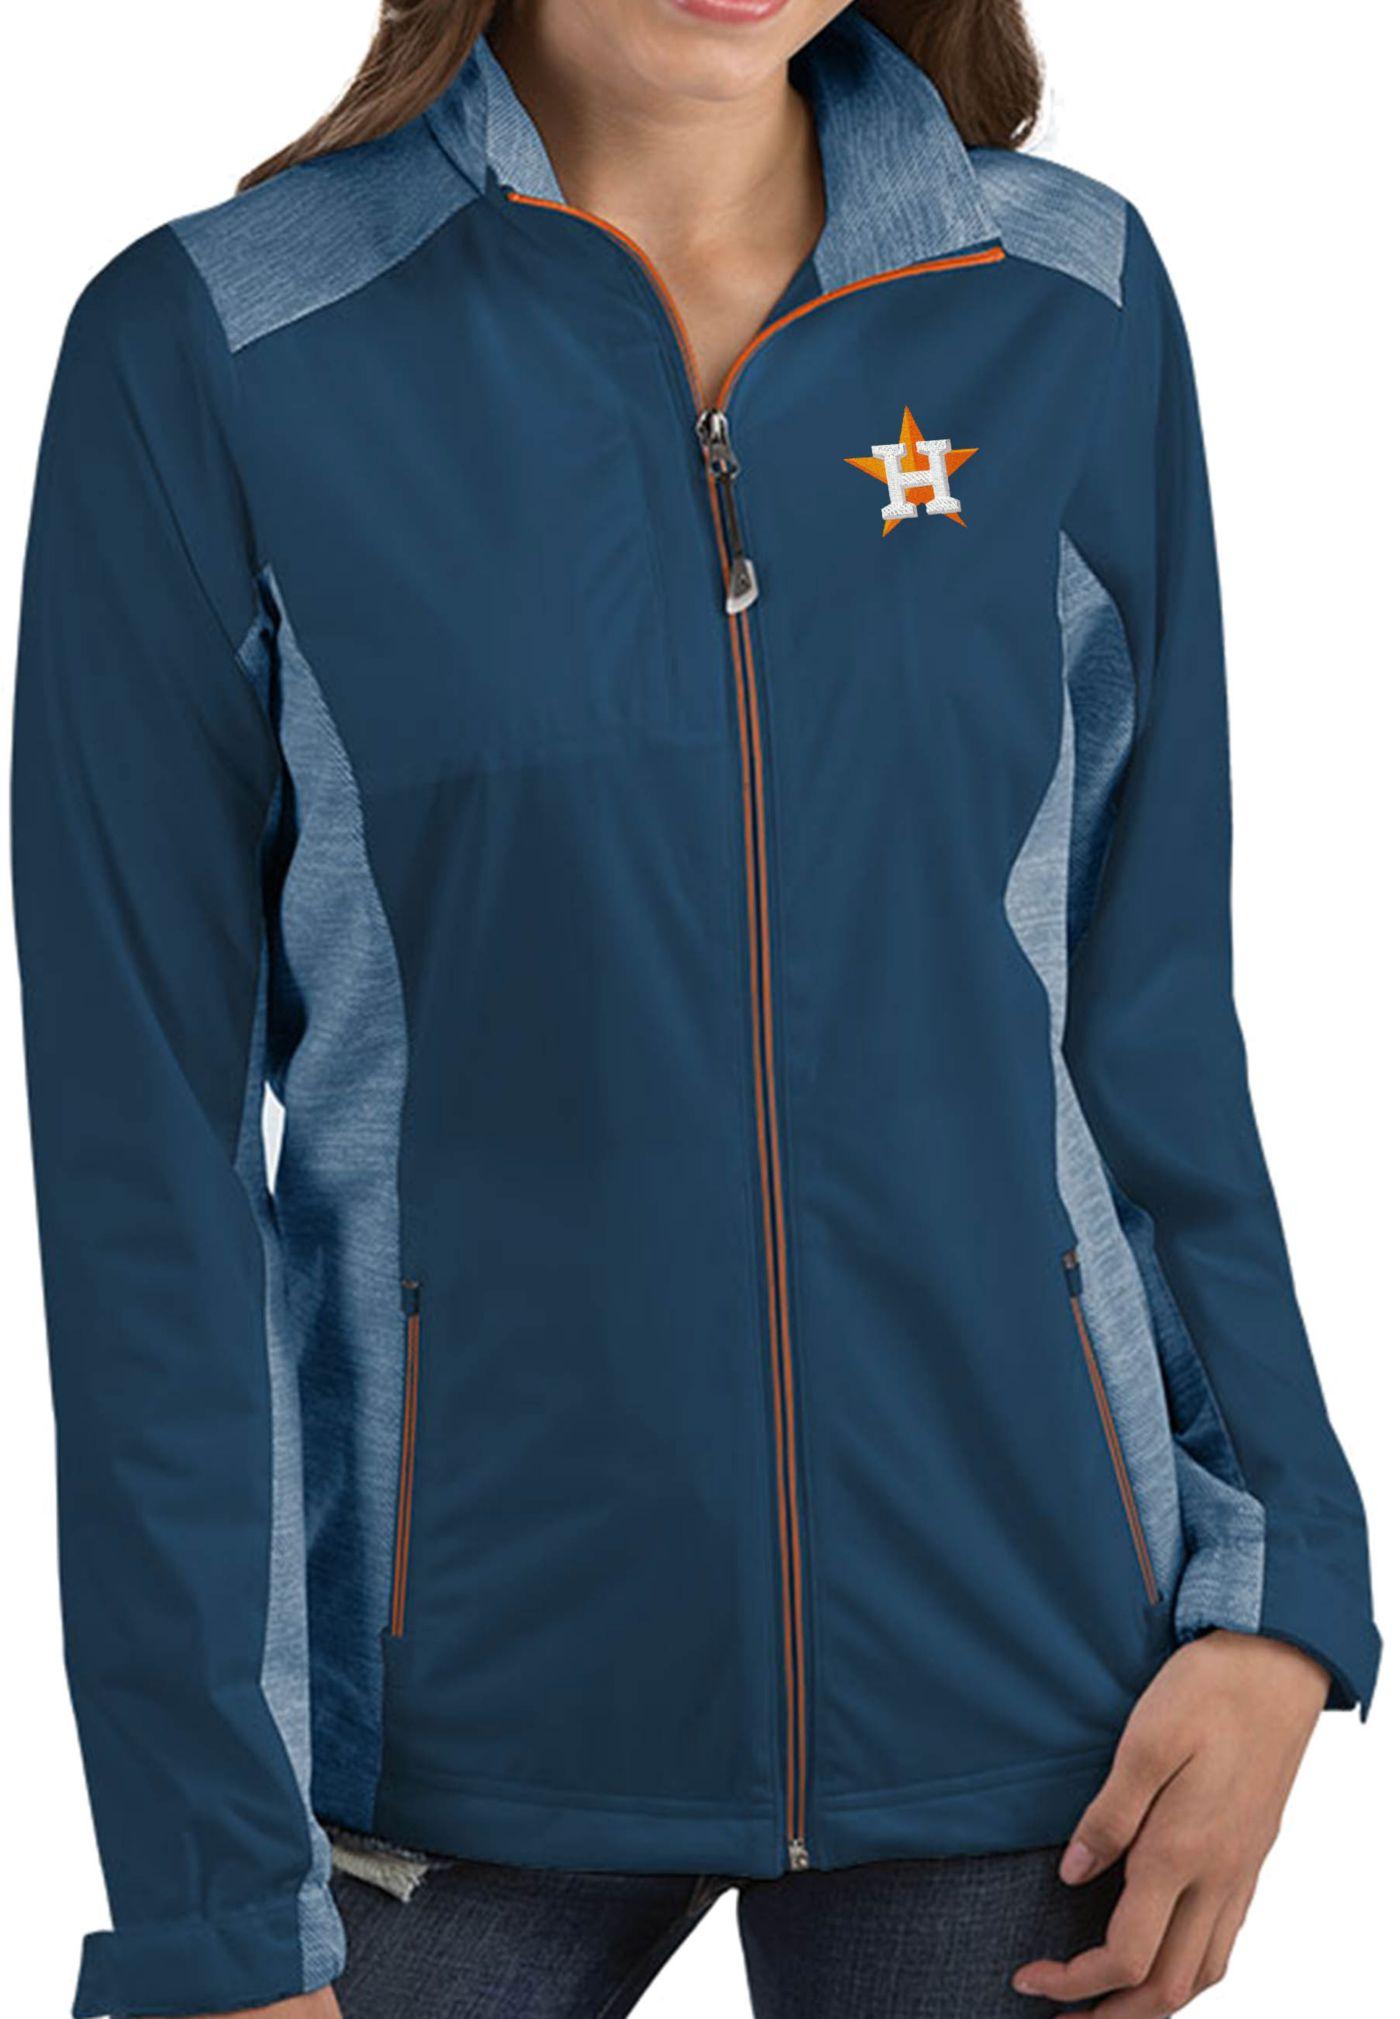 Antigua Women's Houston Astros Revolve Navy Full-Zip Jacket